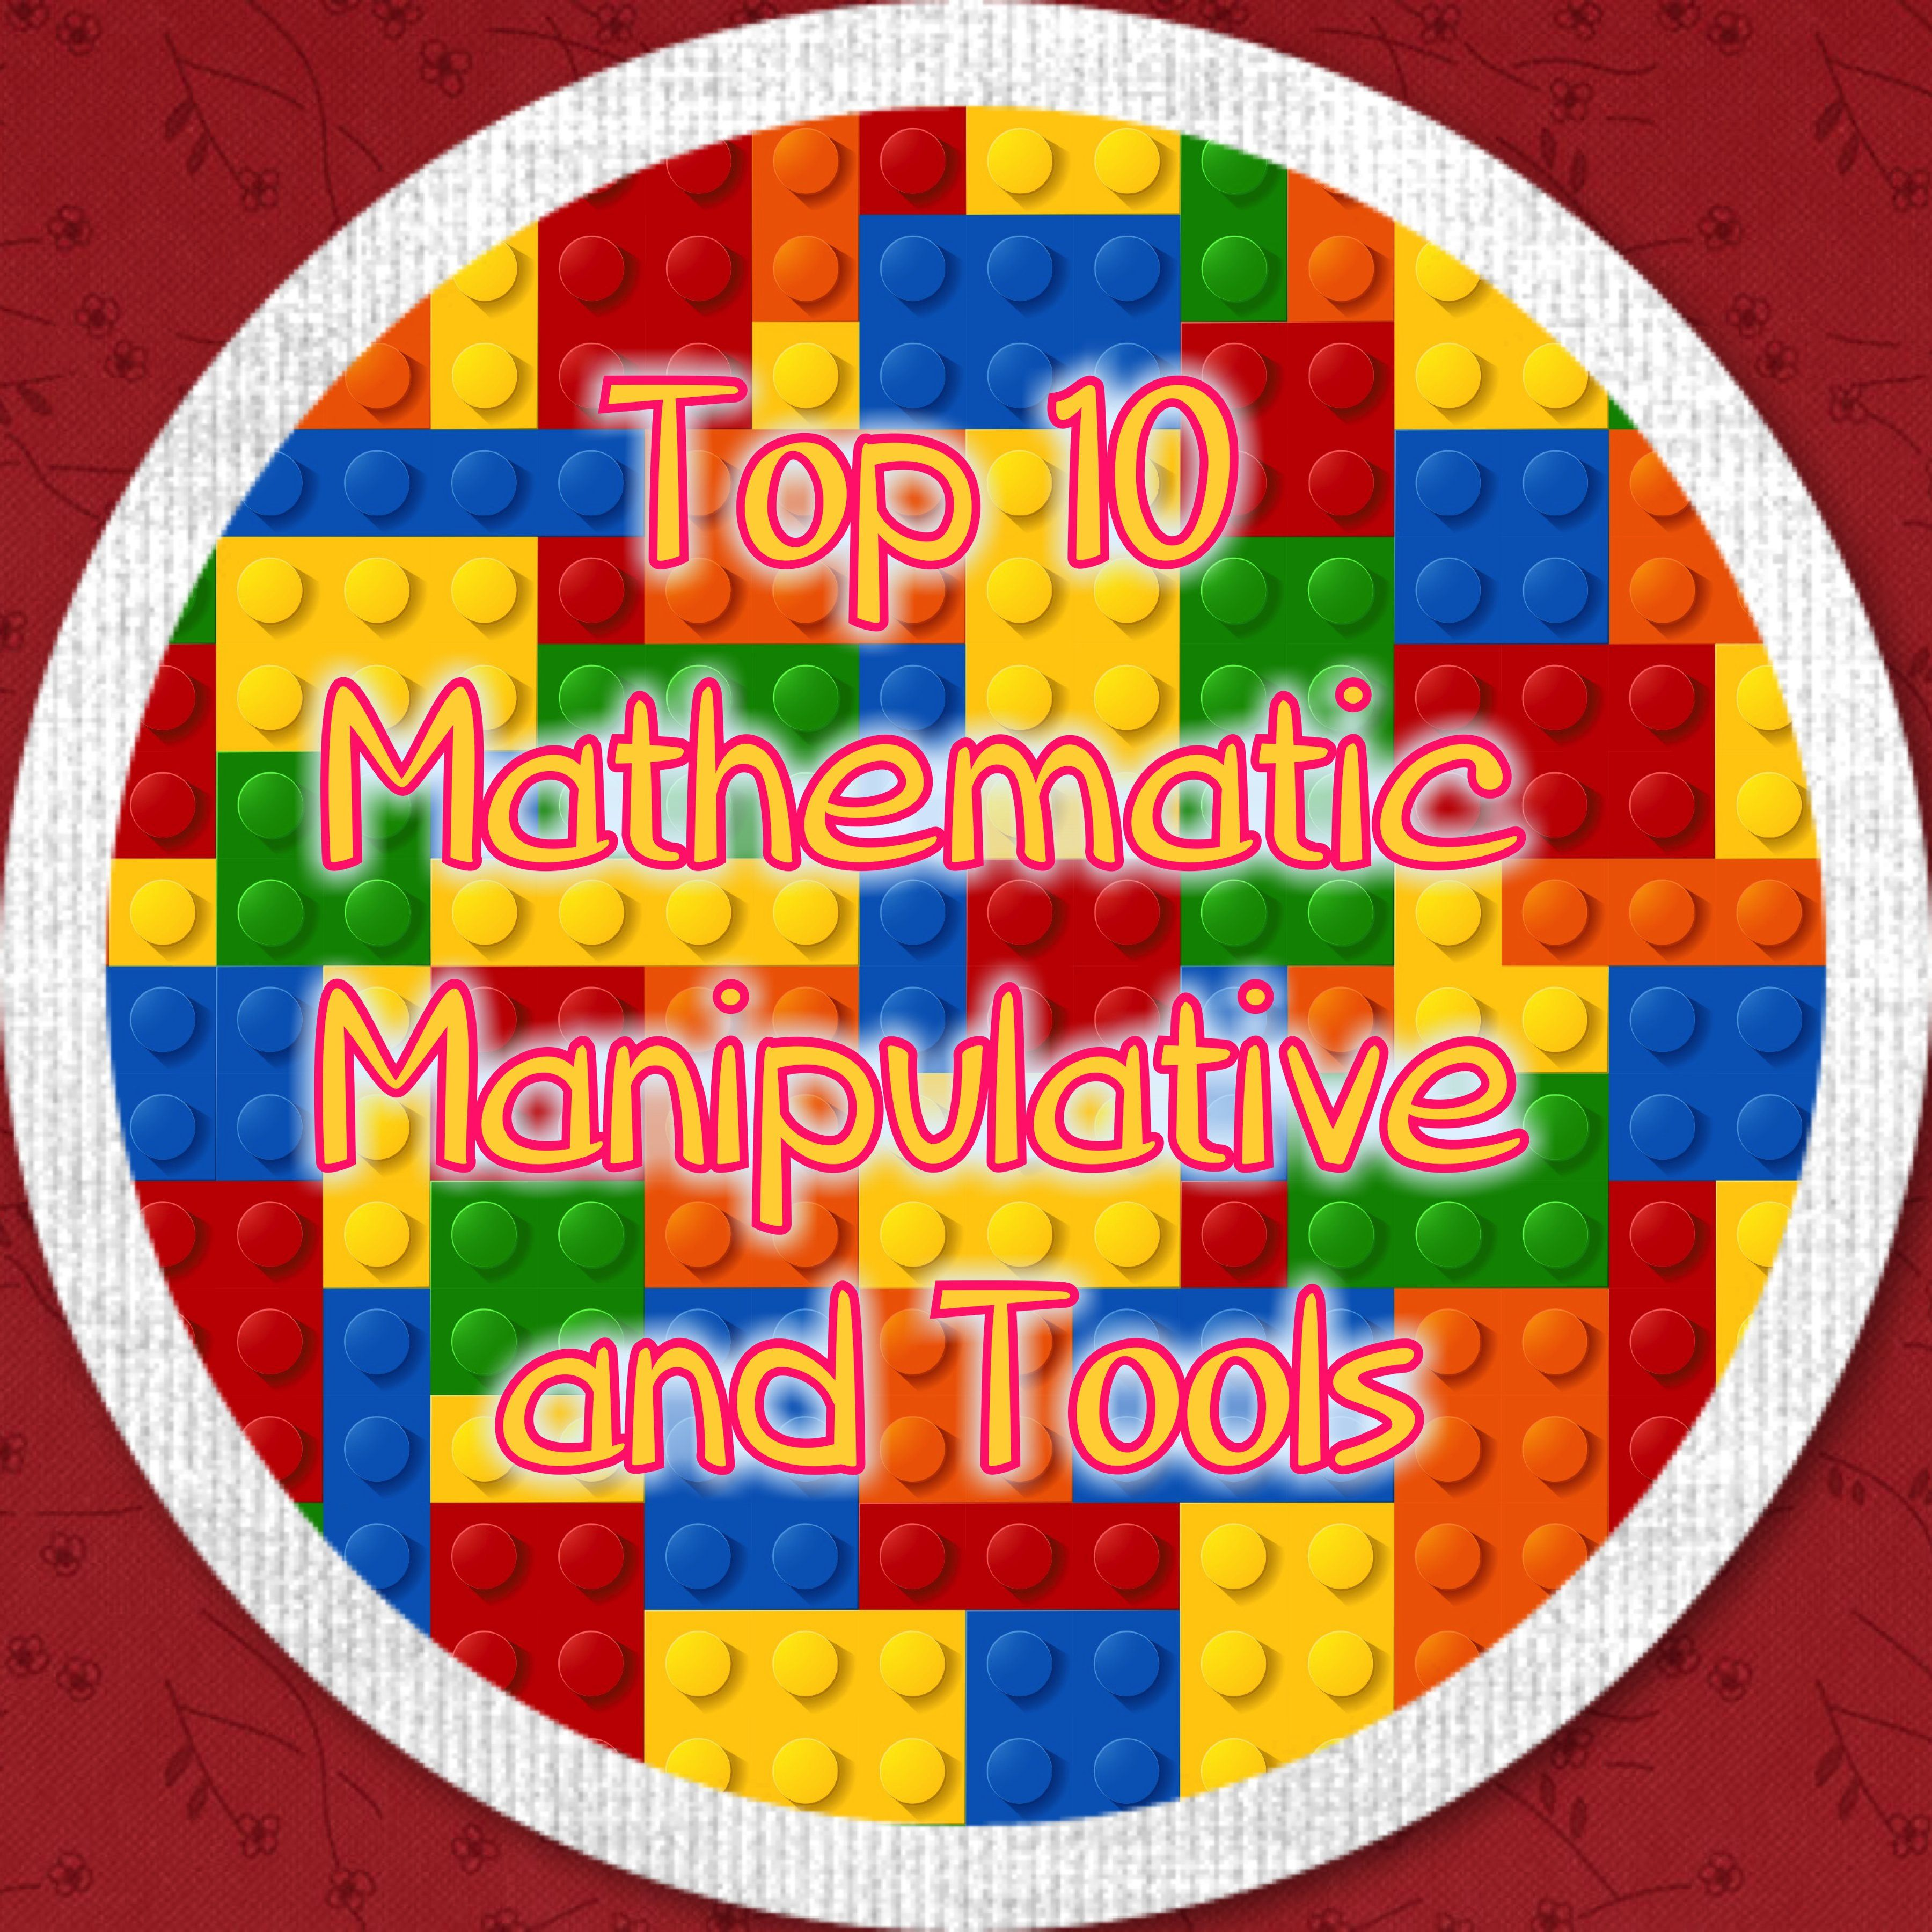 Top 10 Mathematics Manipulative And Tools